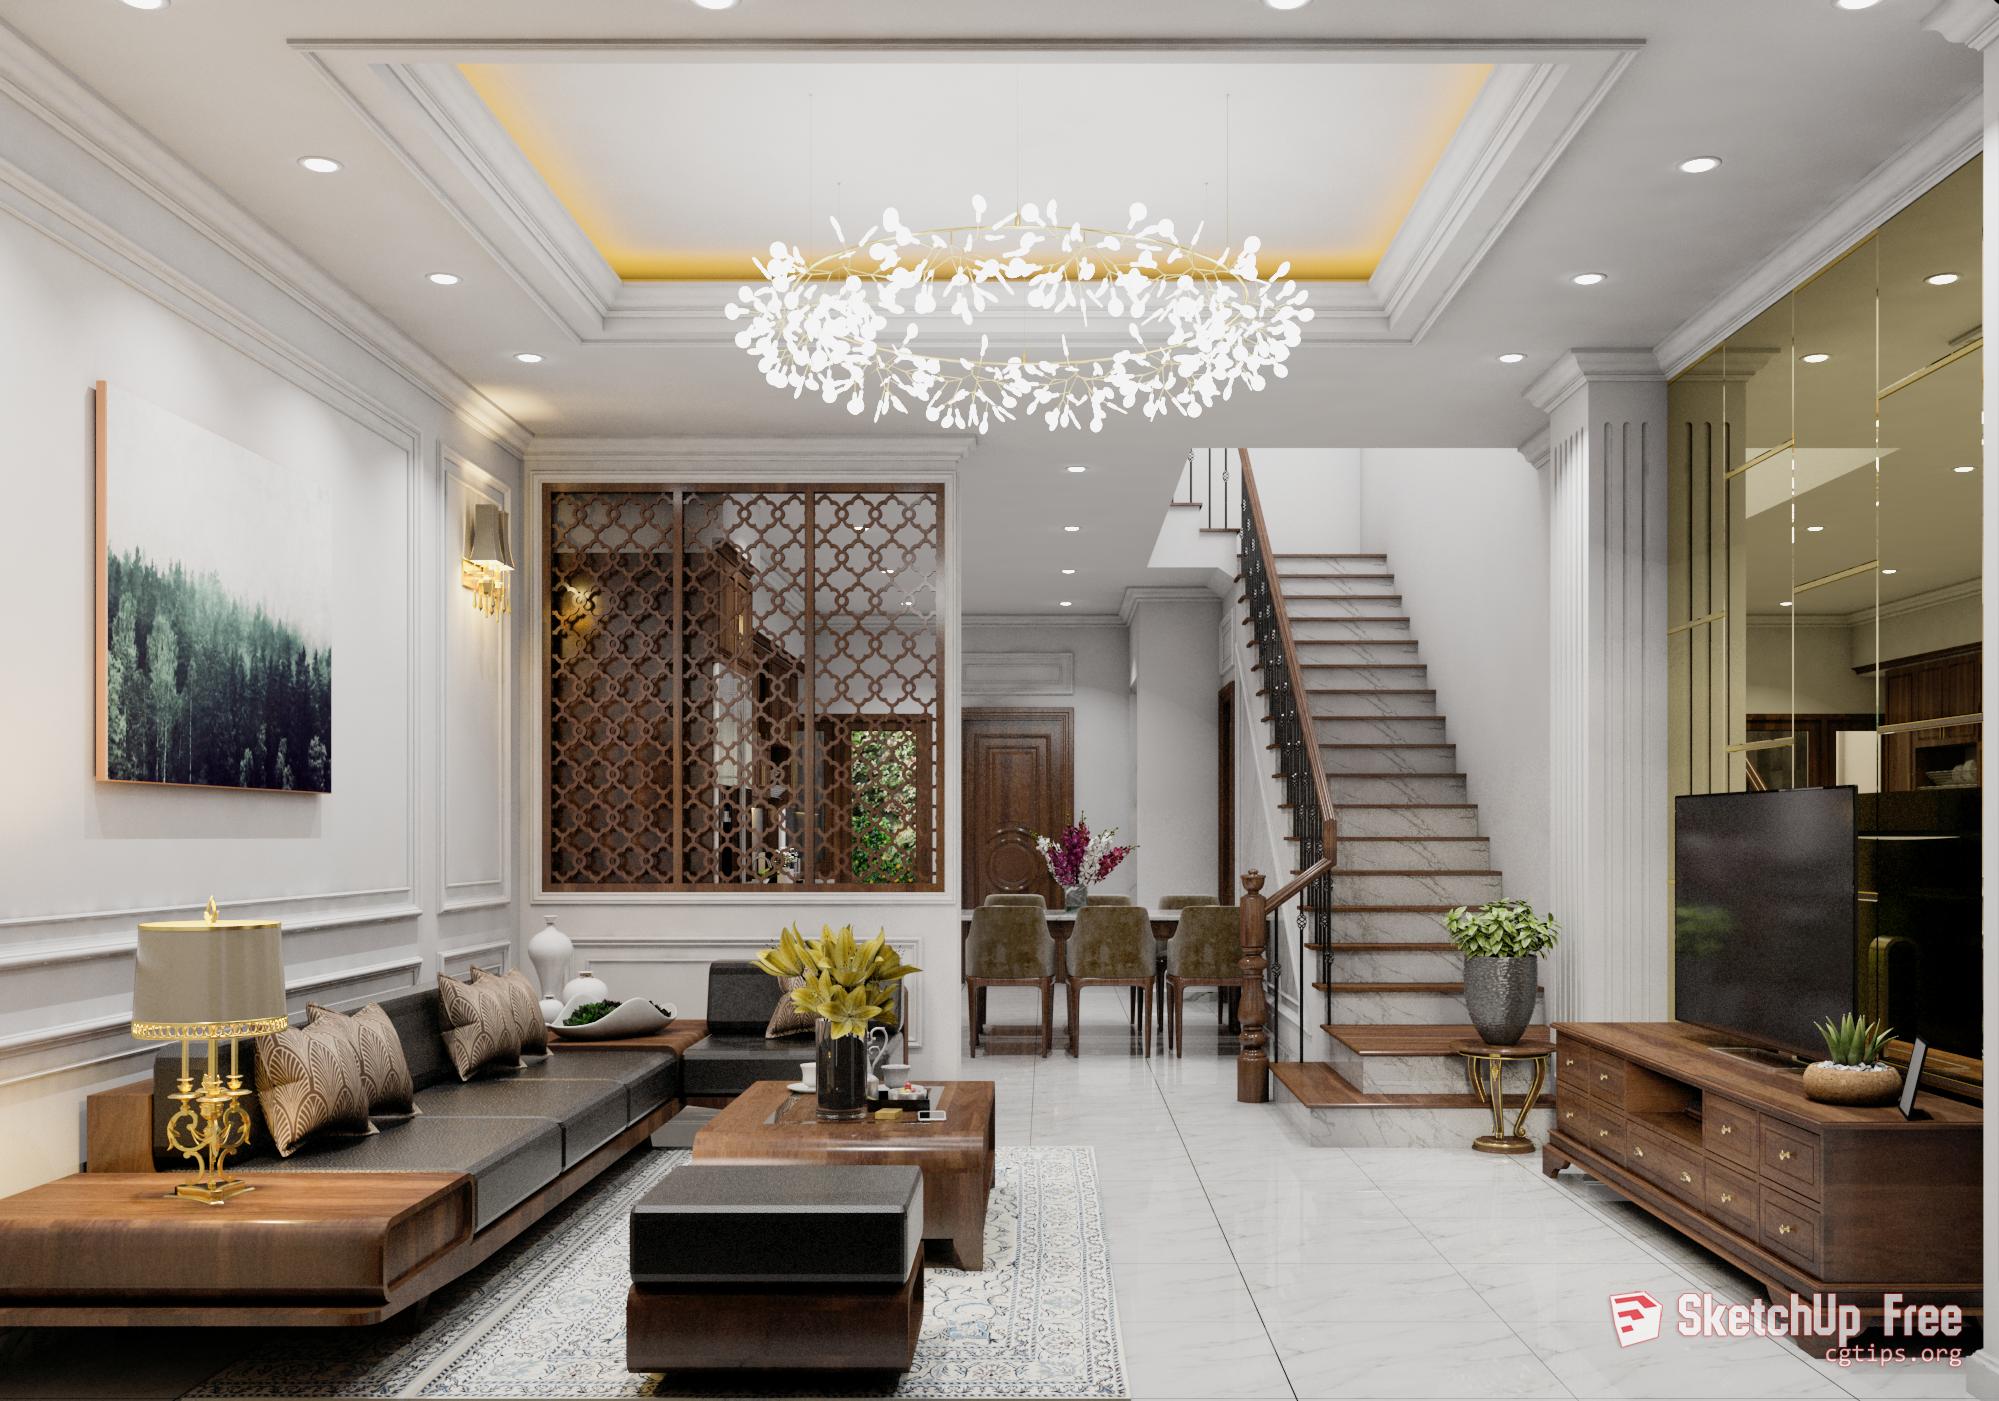 2075 Interior Livingroom Scene Sketchup Model Free Download Living Room Interior Sketchup Model Living Room Designs